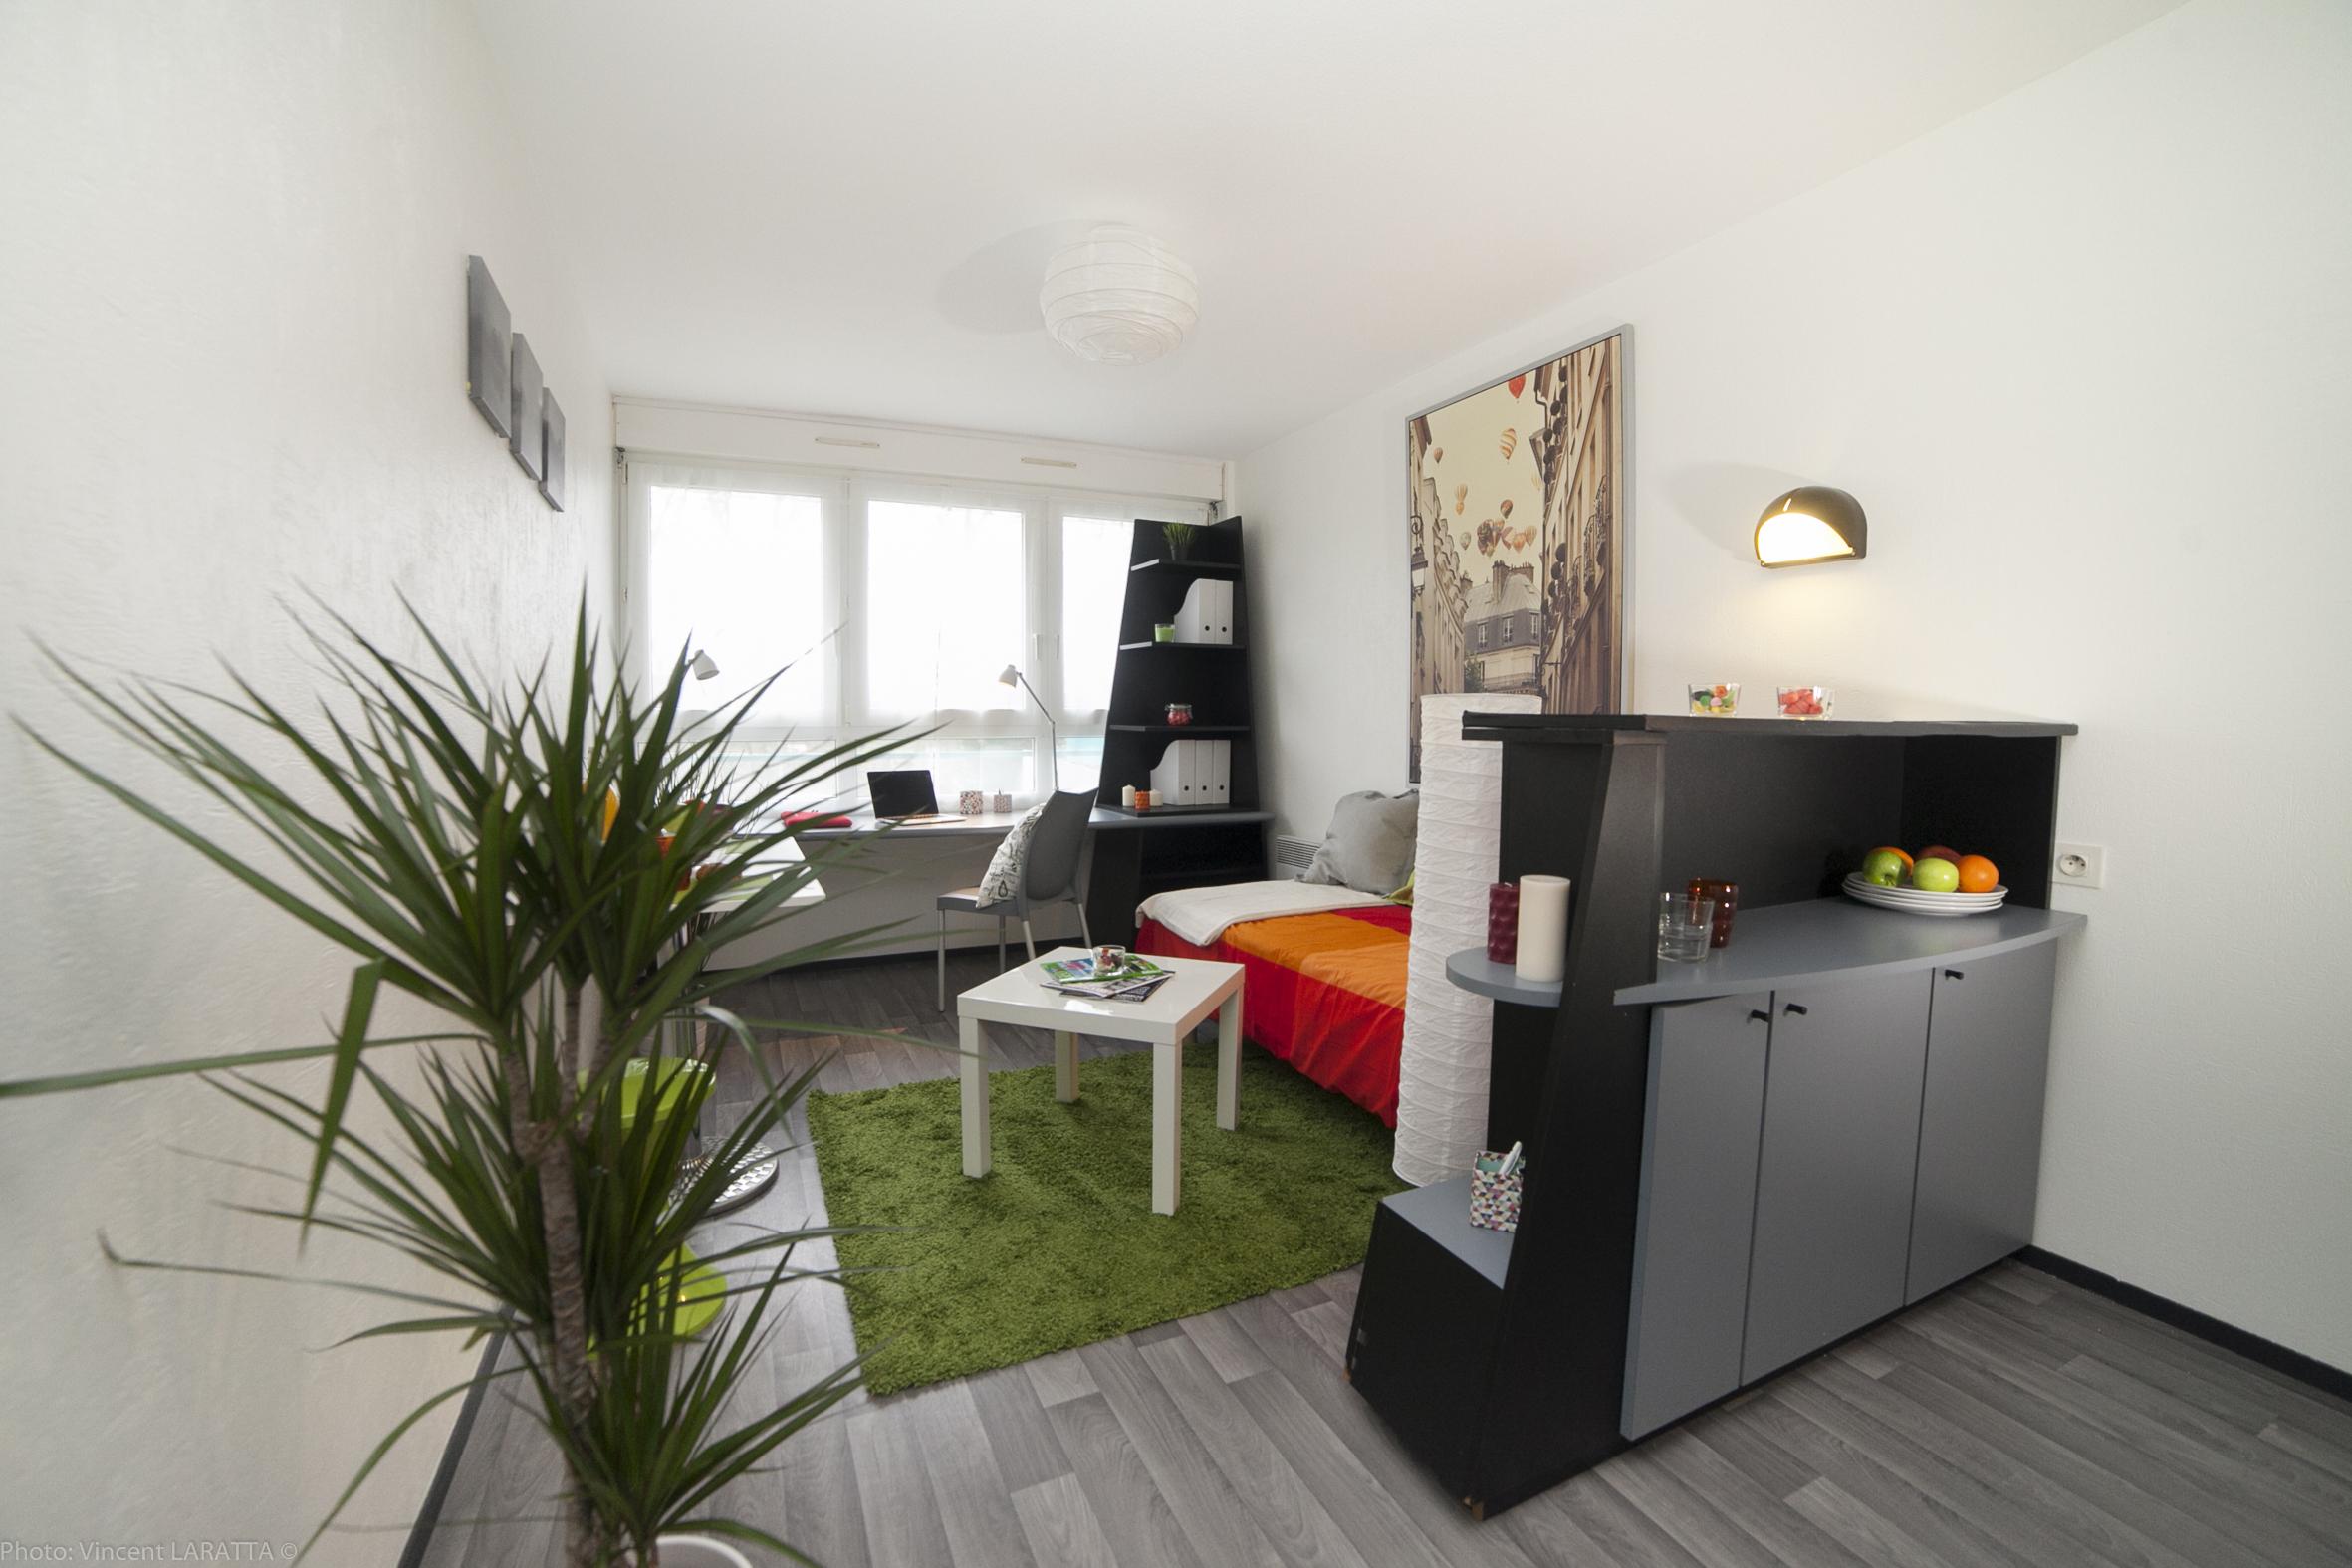 r sidence tudiante insa logement tudiant le parisien etudiant. Black Bedroom Furniture Sets. Home Design Ideas